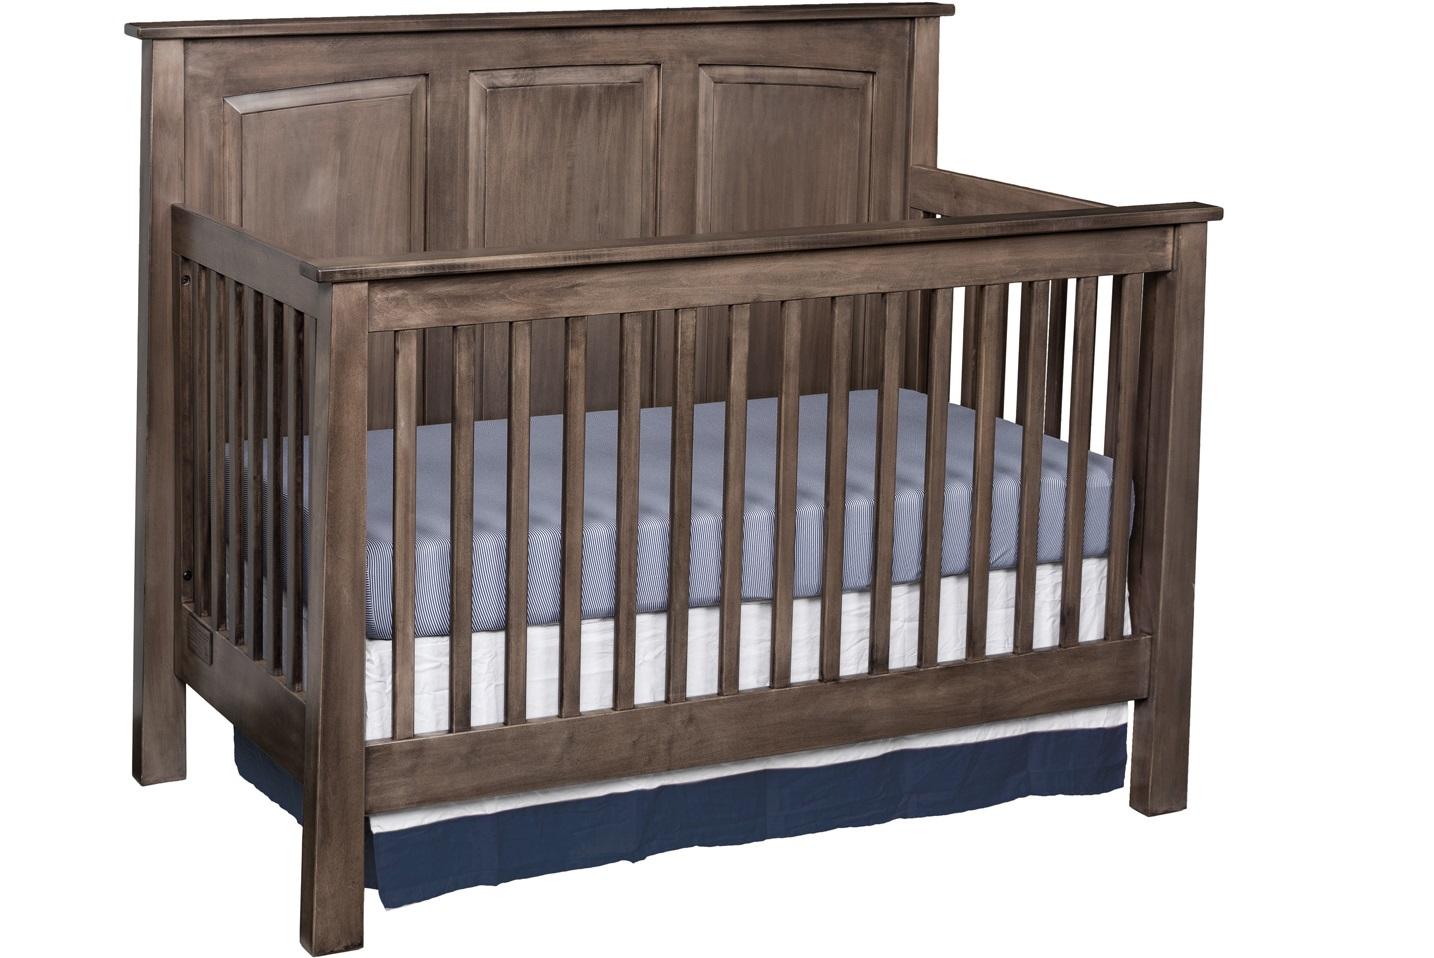 Shaker Crib.jpg